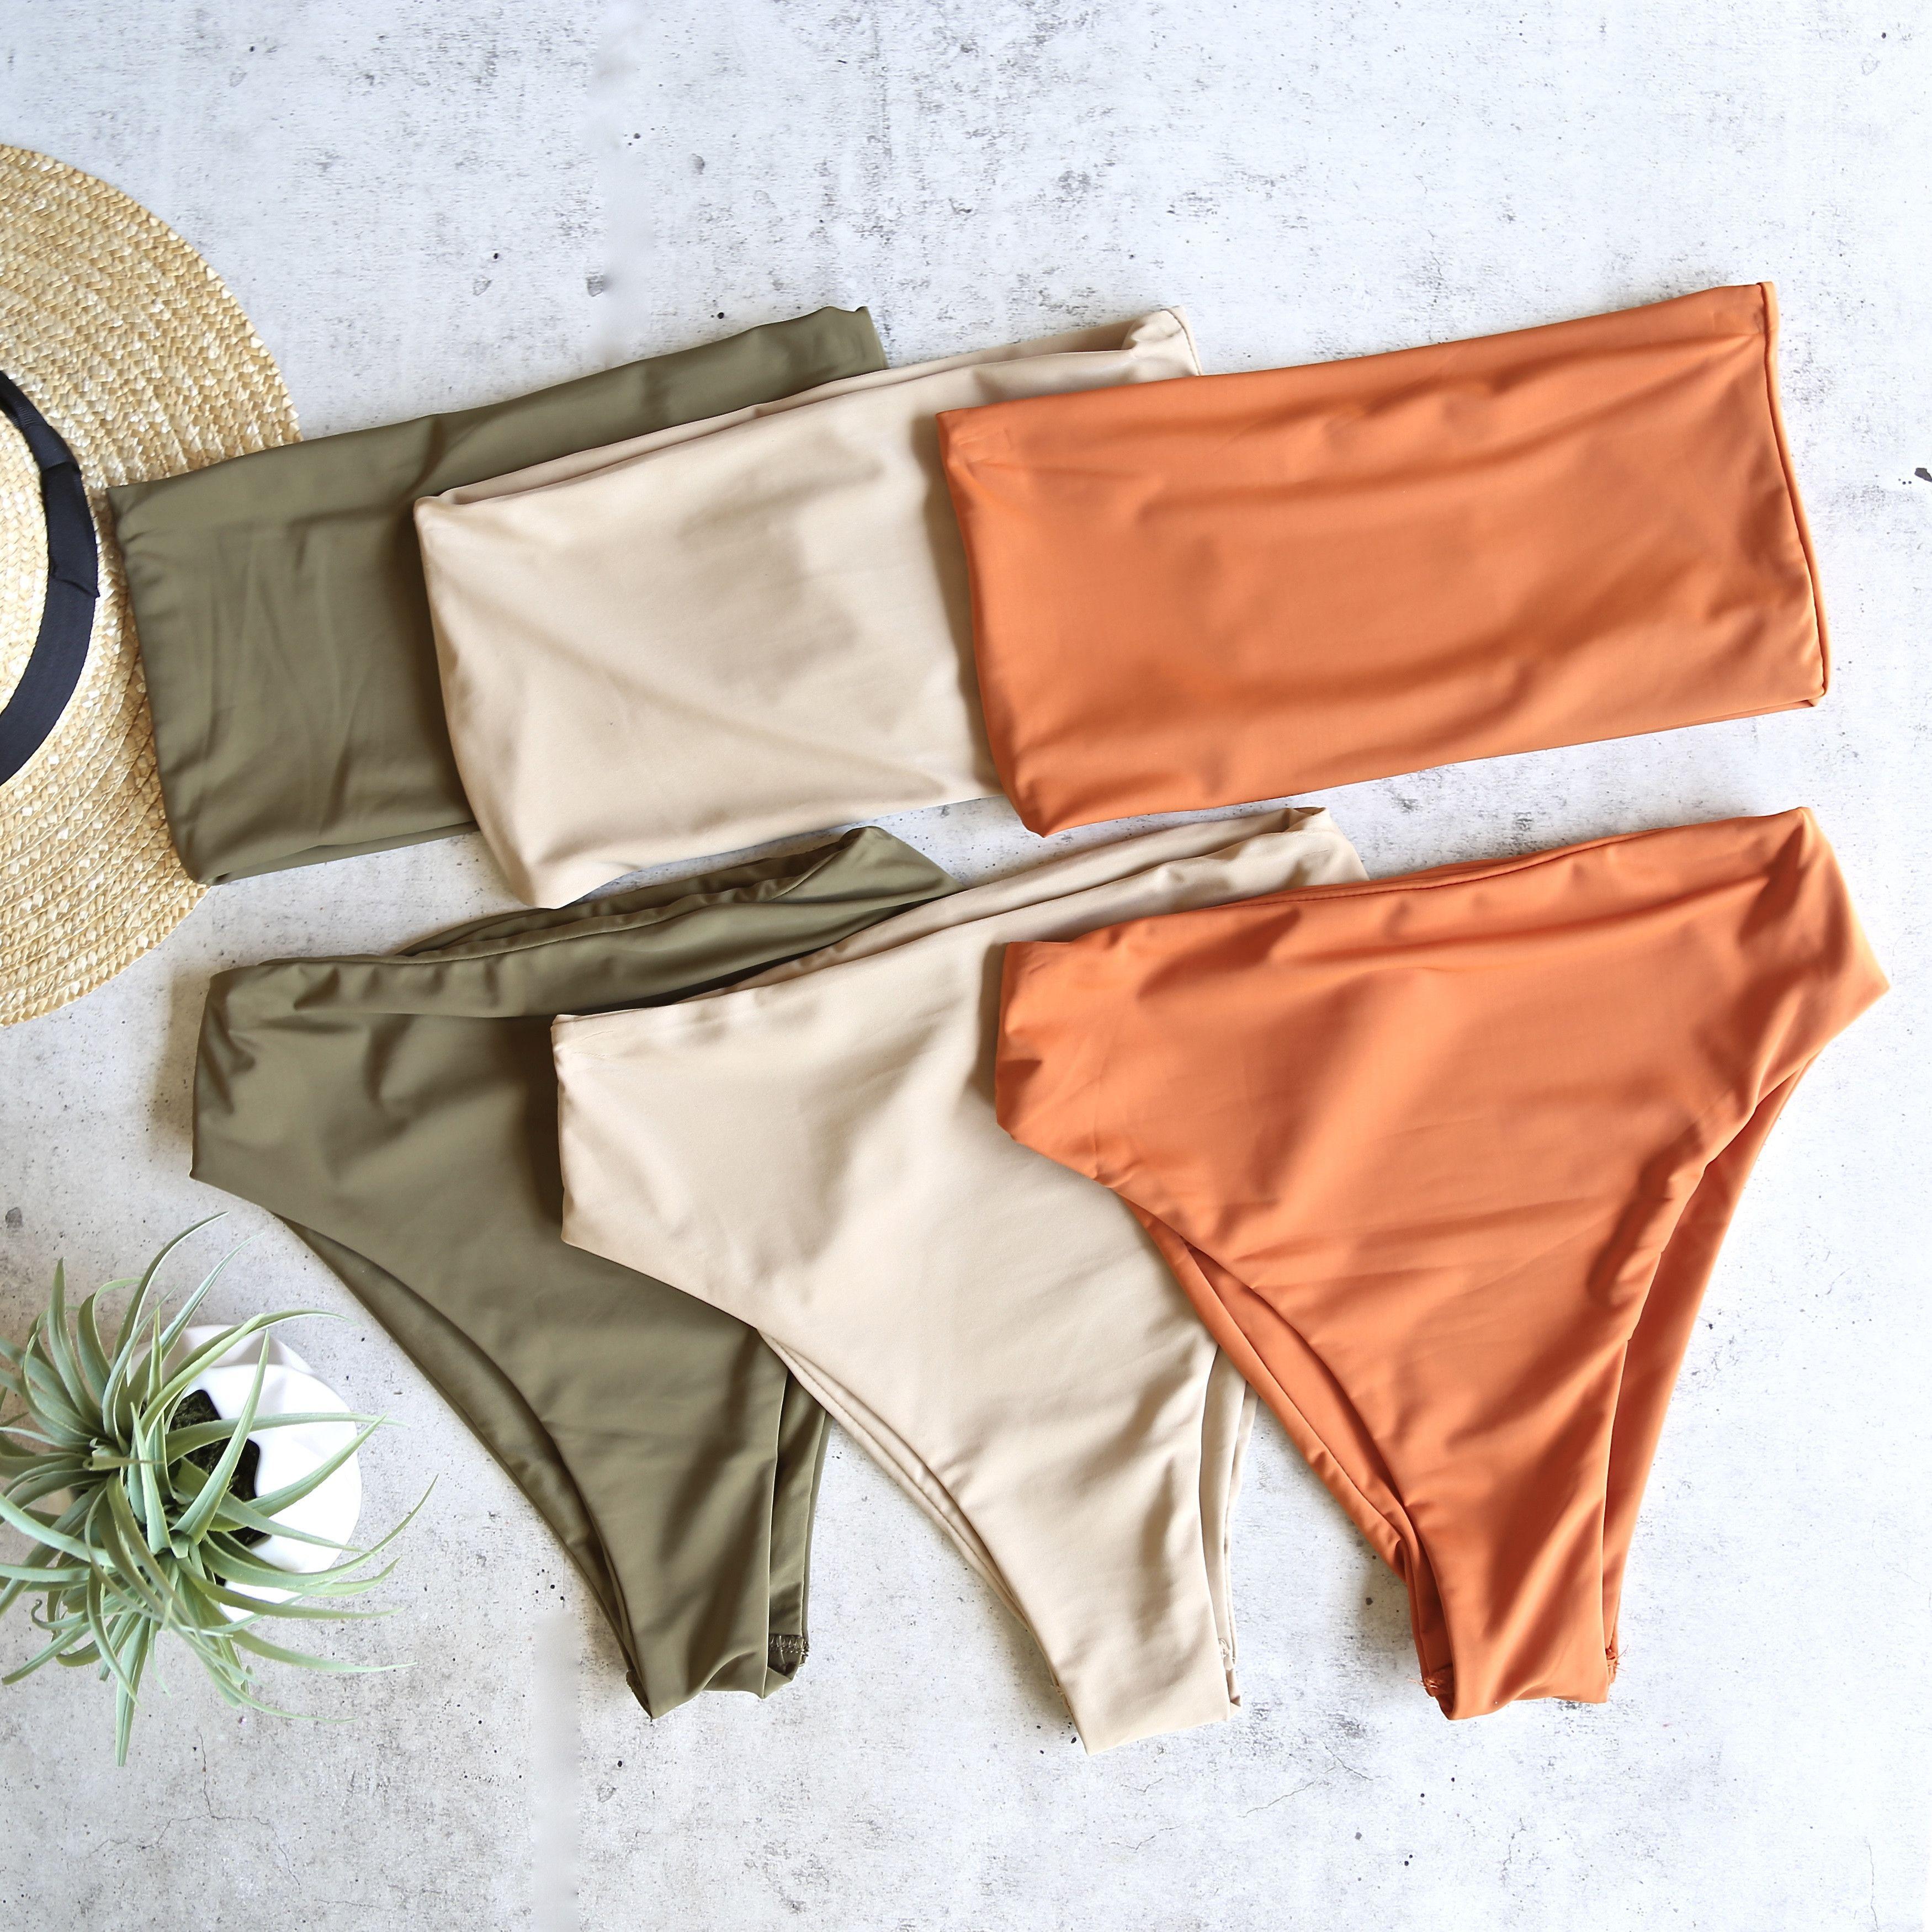 a1d3410a80de8 Reverse - lean on - high waisted bandeau bikini set - more colors in ...